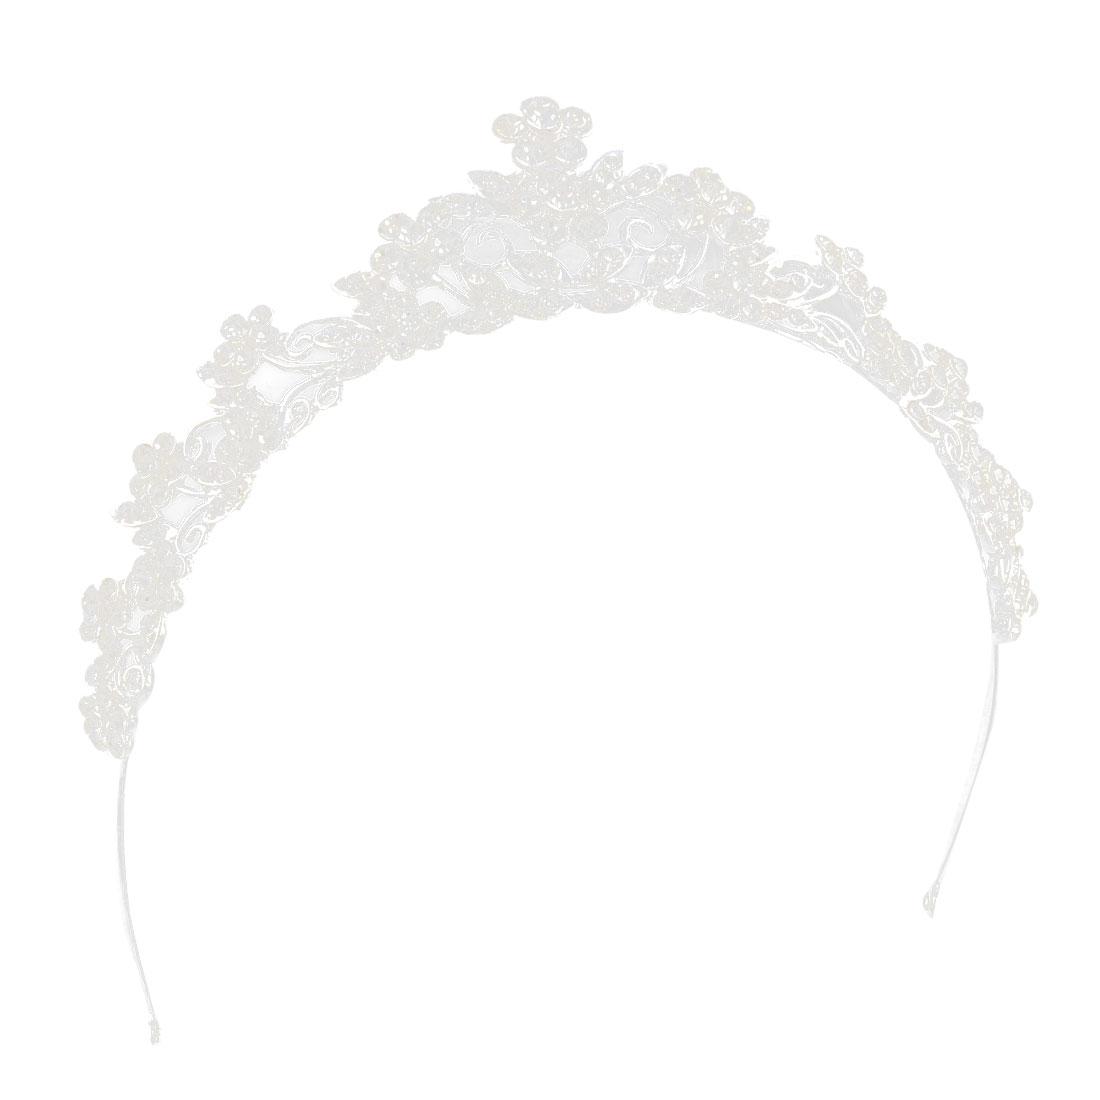 Bridal Bride Rhinestone Inlaid Floral Headpiece Crown Tiara Decoration